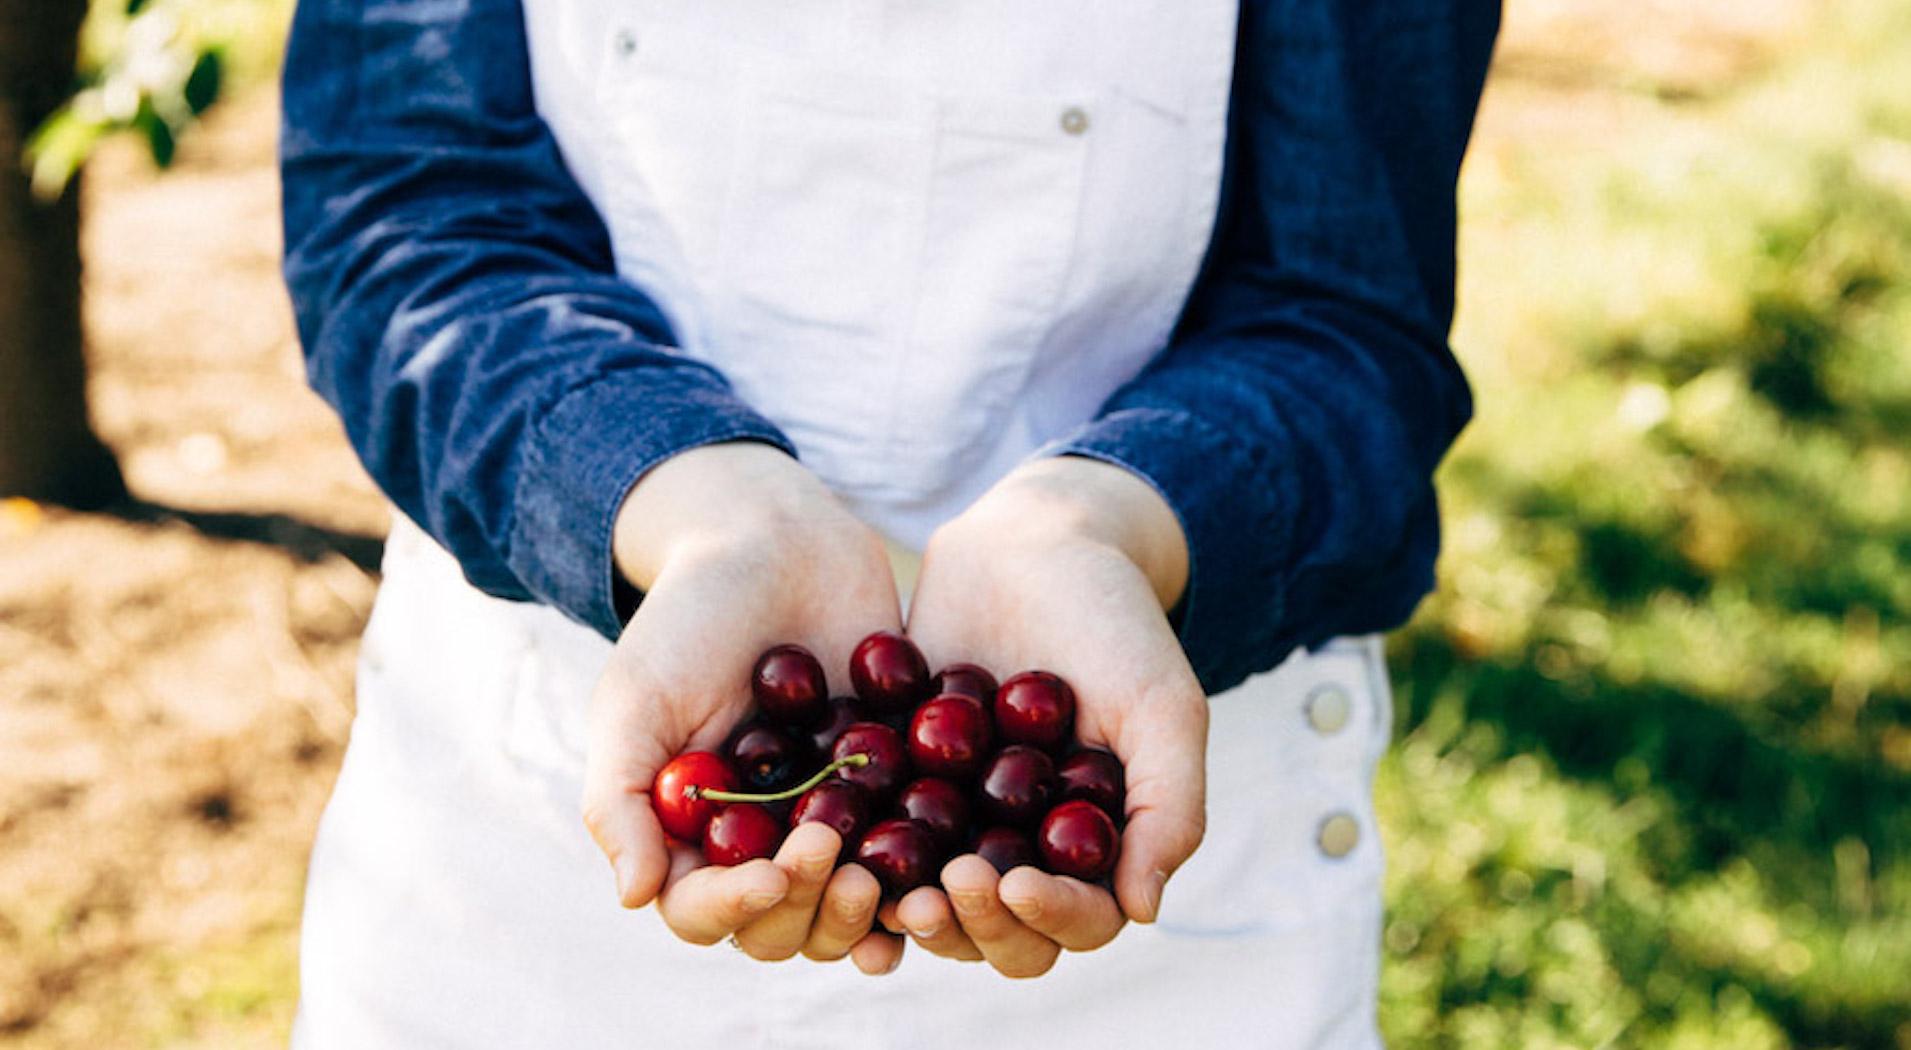 Northern Michigan Cherry Grower